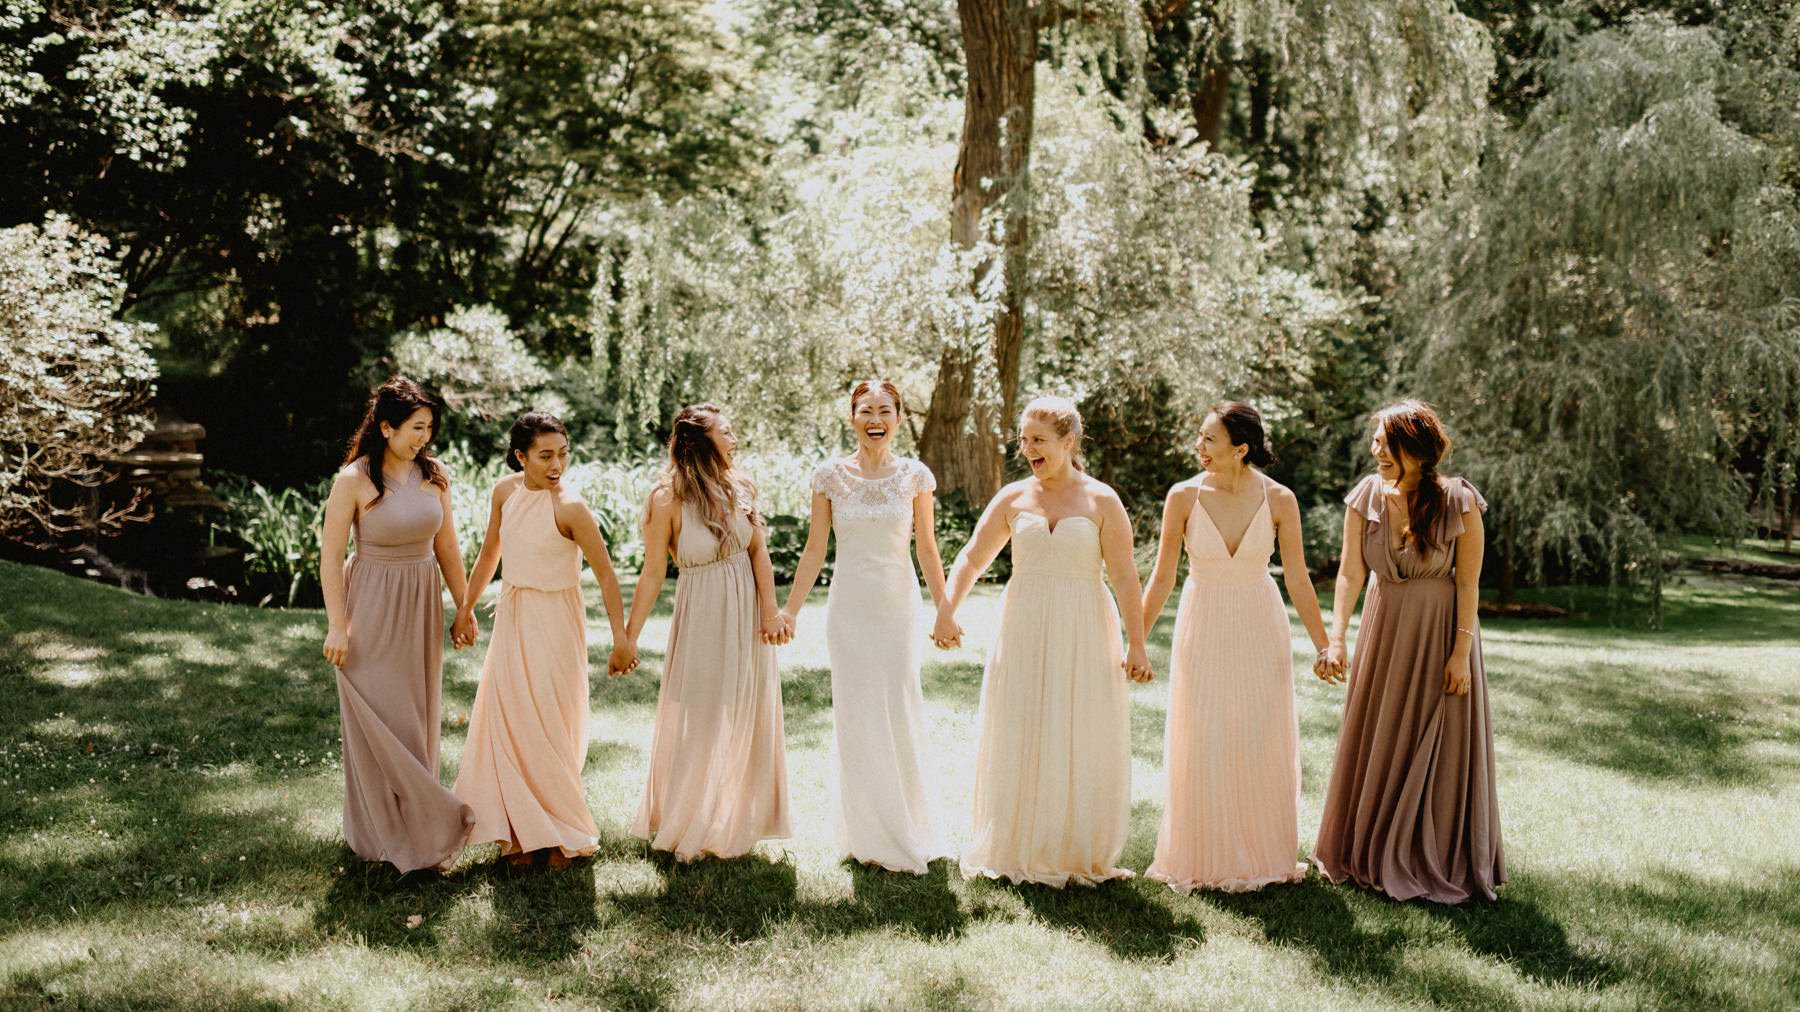 Appleford-estate-wedding-55.jpg